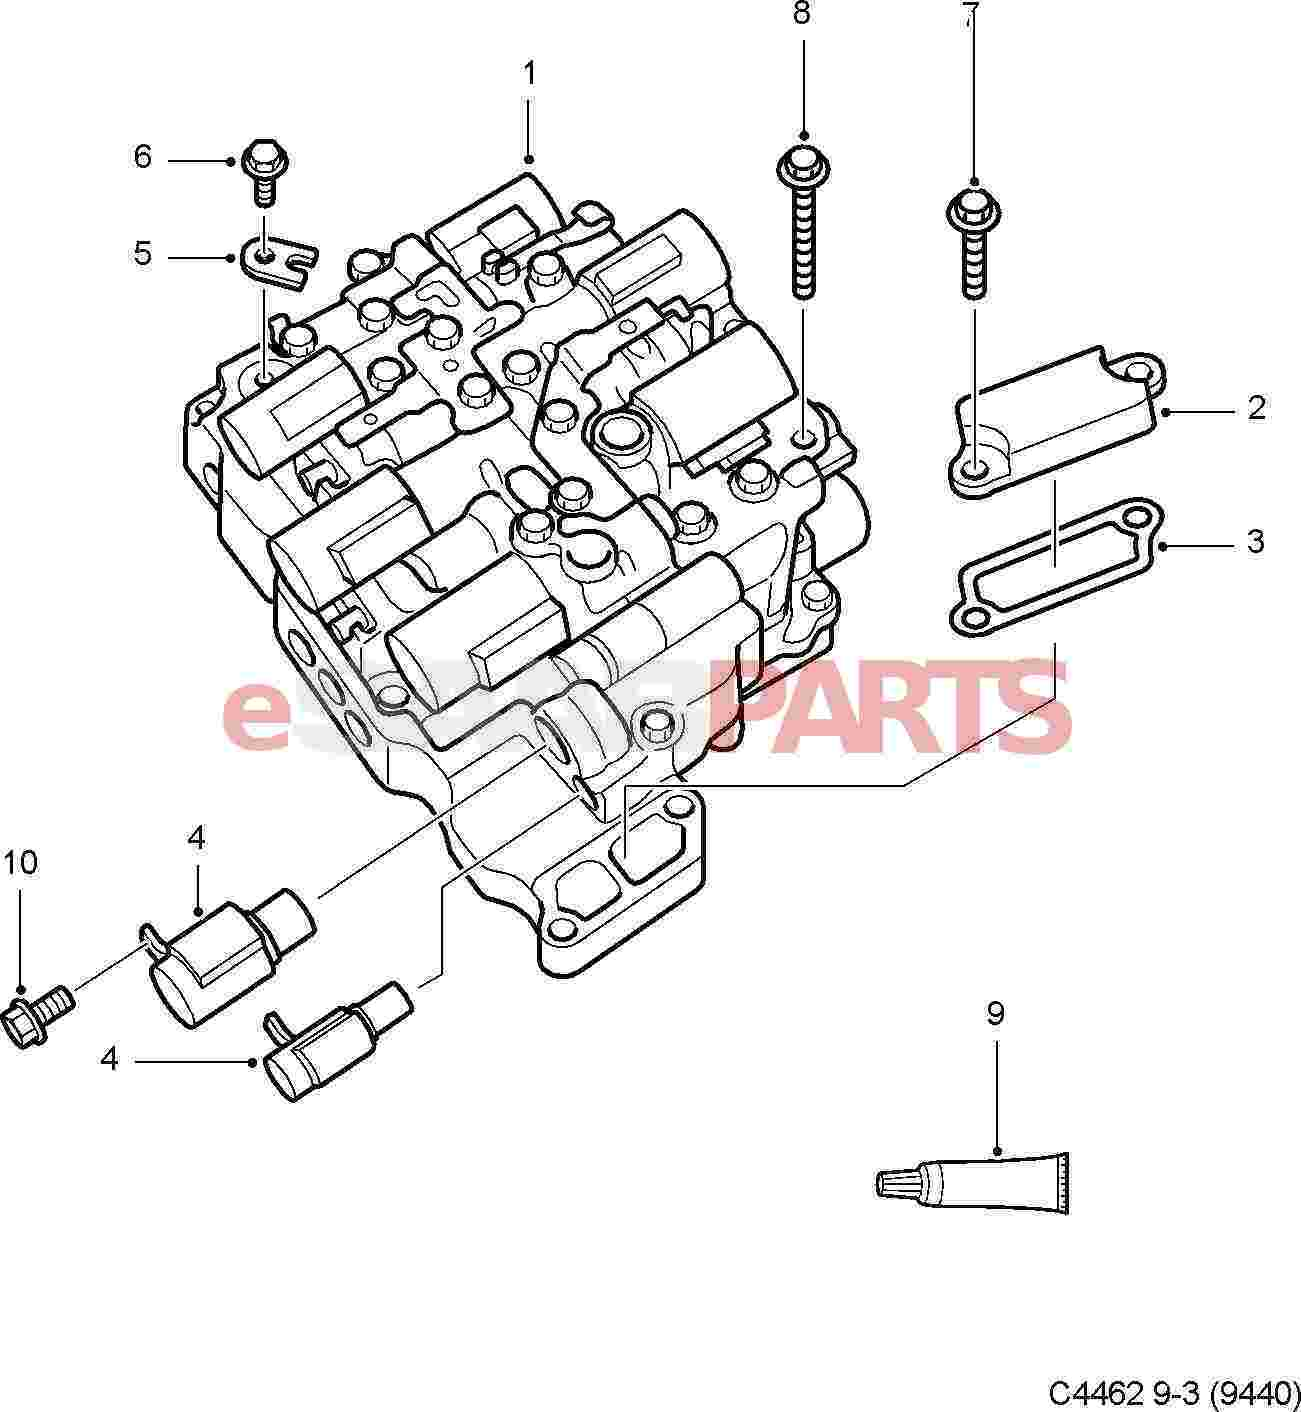 hight resolution of esaabparts com saab 9 3 9440 u003e transmission parts u003e transmission saab 9 3 automatic diagram